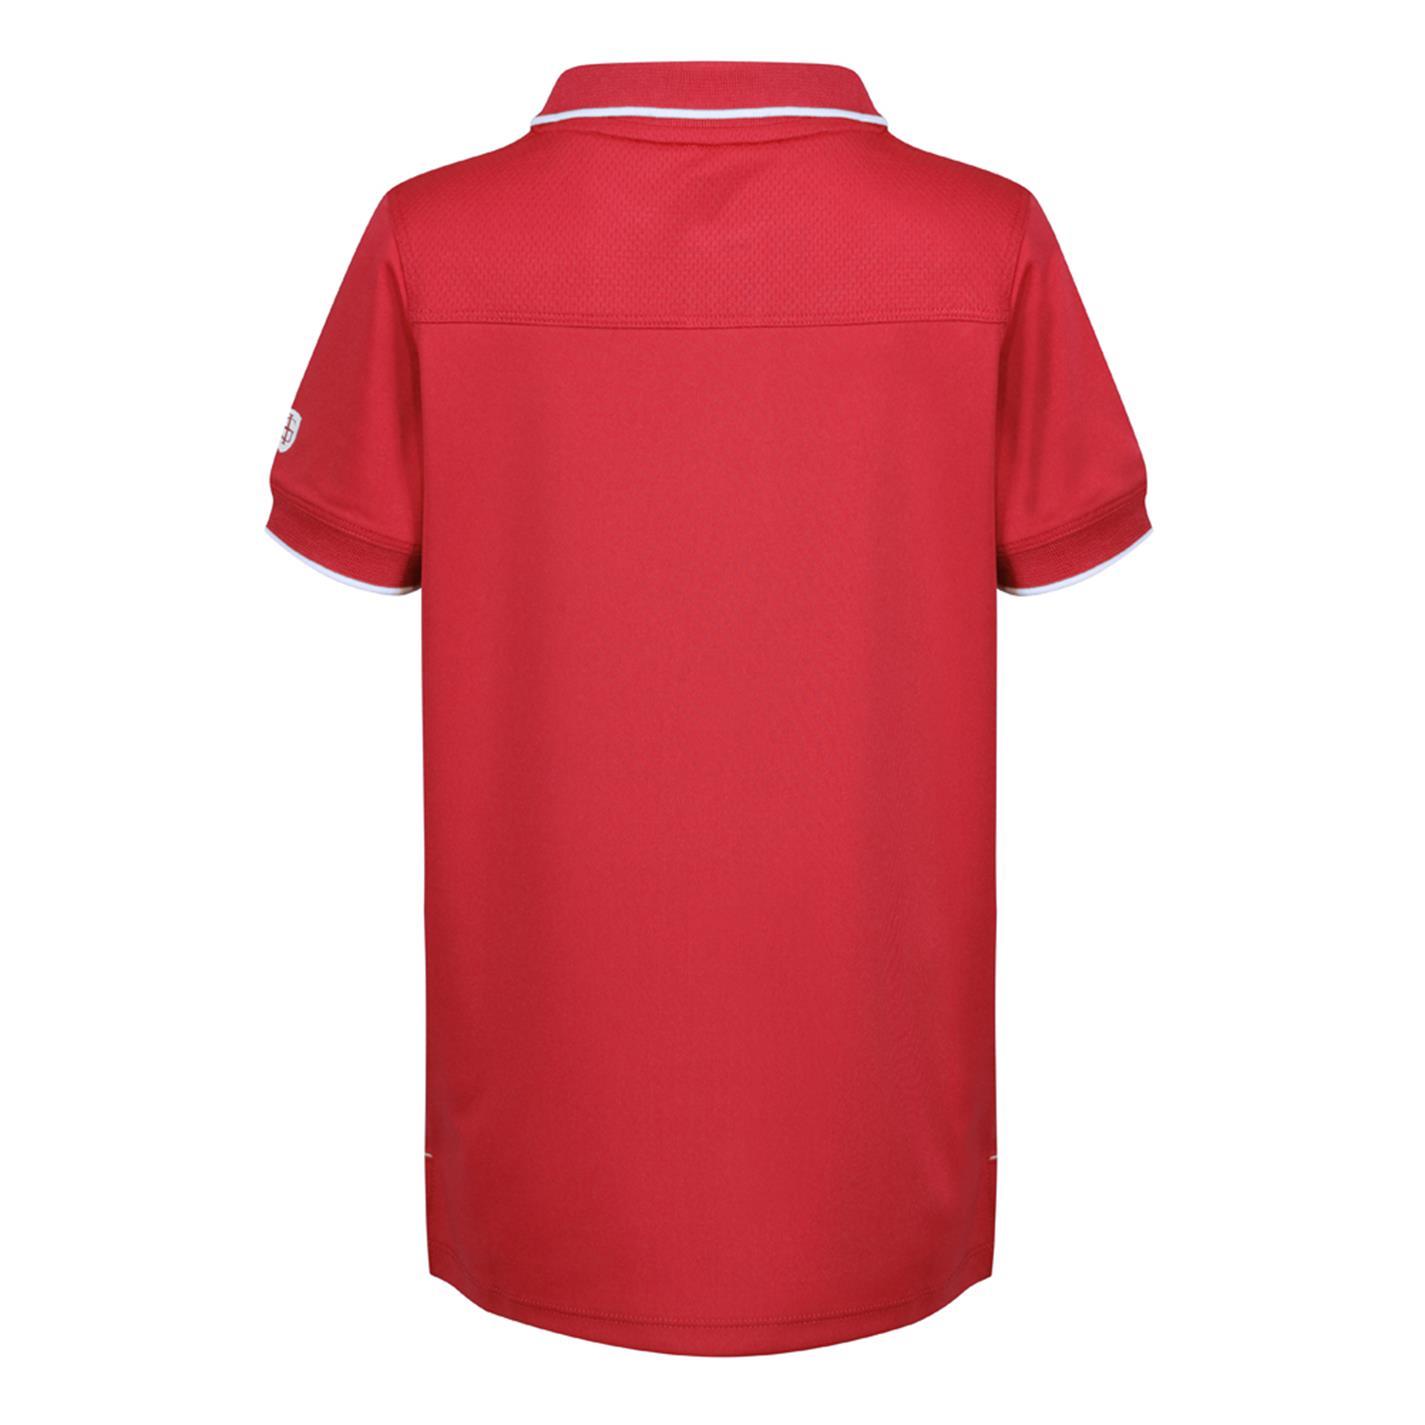 Tricouri Polo Island verde Golf pentru copii rosu